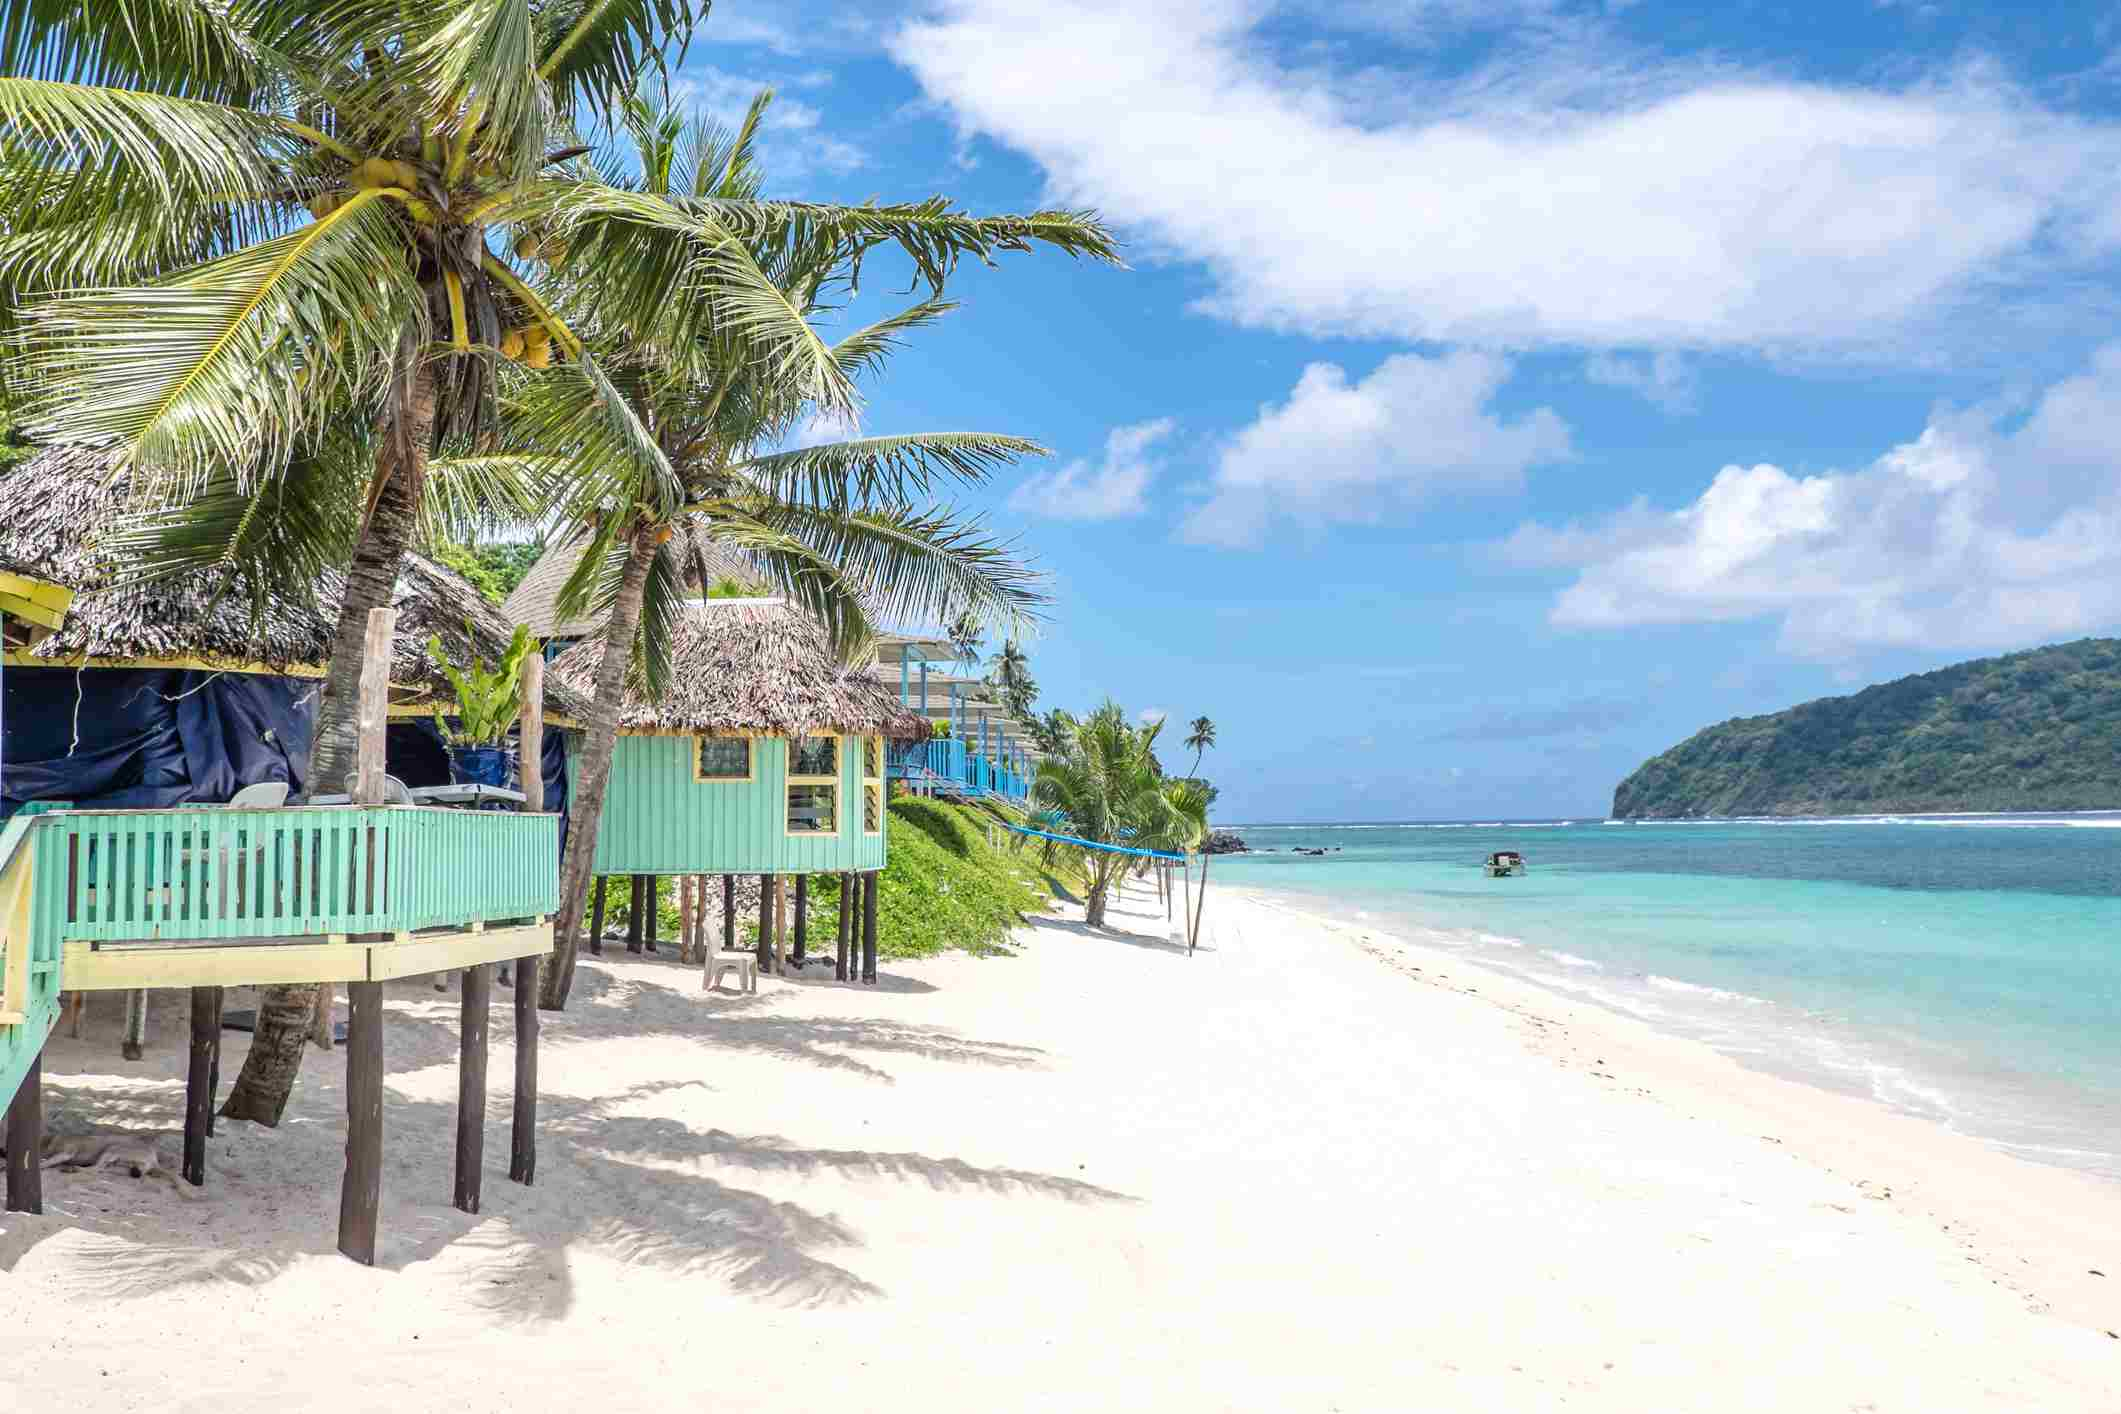 View along Lalomanu Beach, Upolu Island, Samoa, of colorful Samoan beach fale huts that are an alternative to hotel or resort accommodation